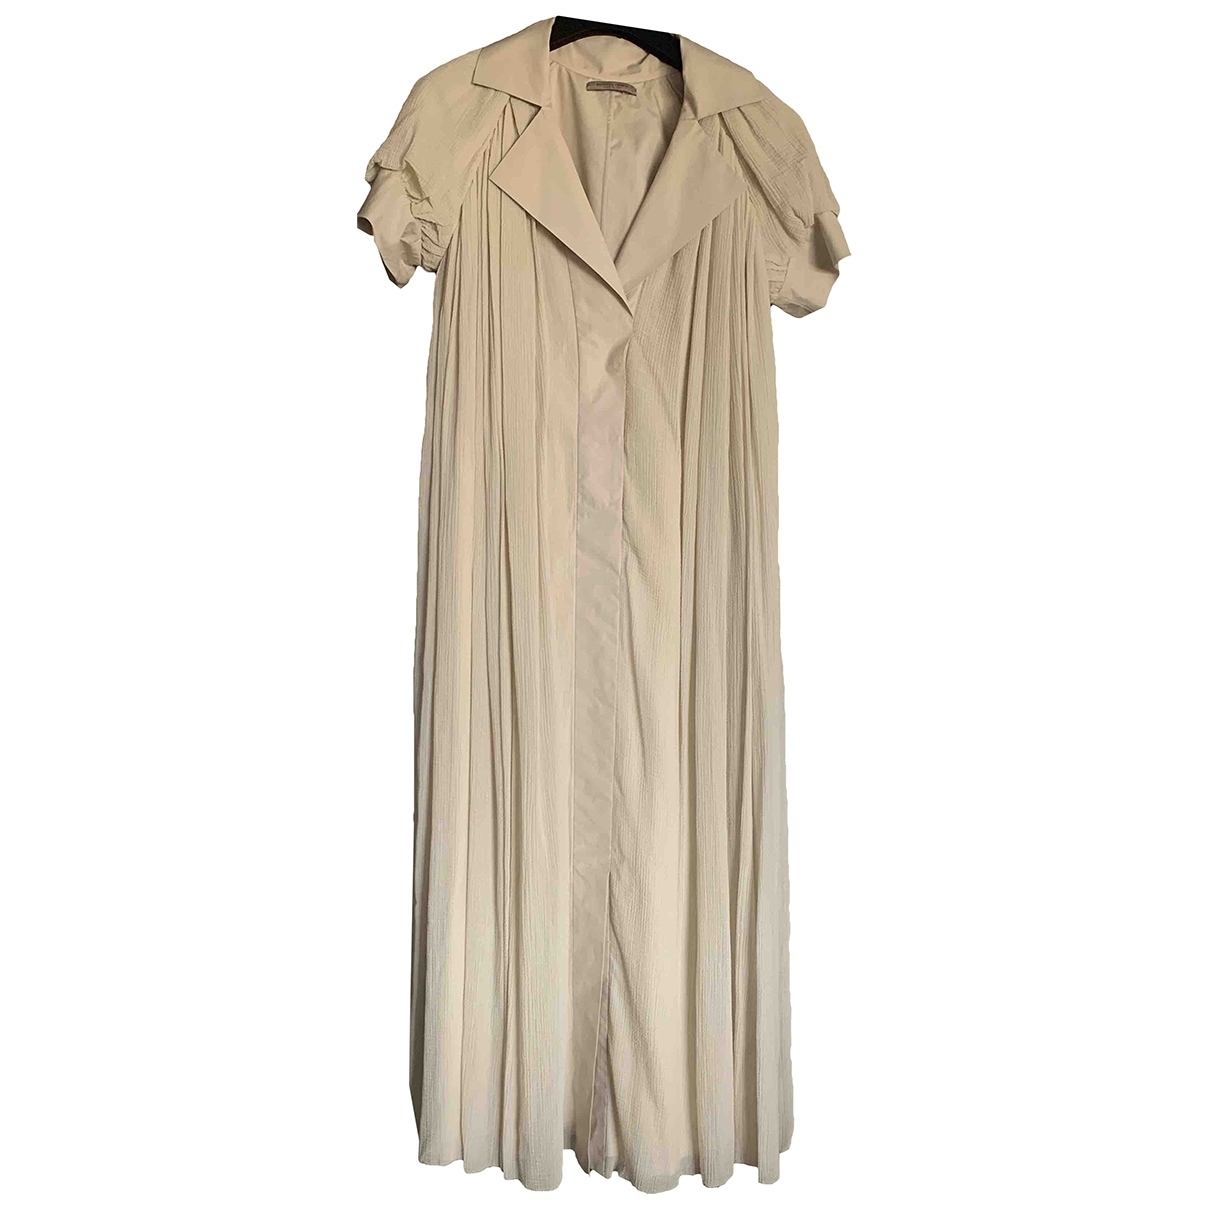 Bottega Veneta - Robe   pour femme en coton - beige